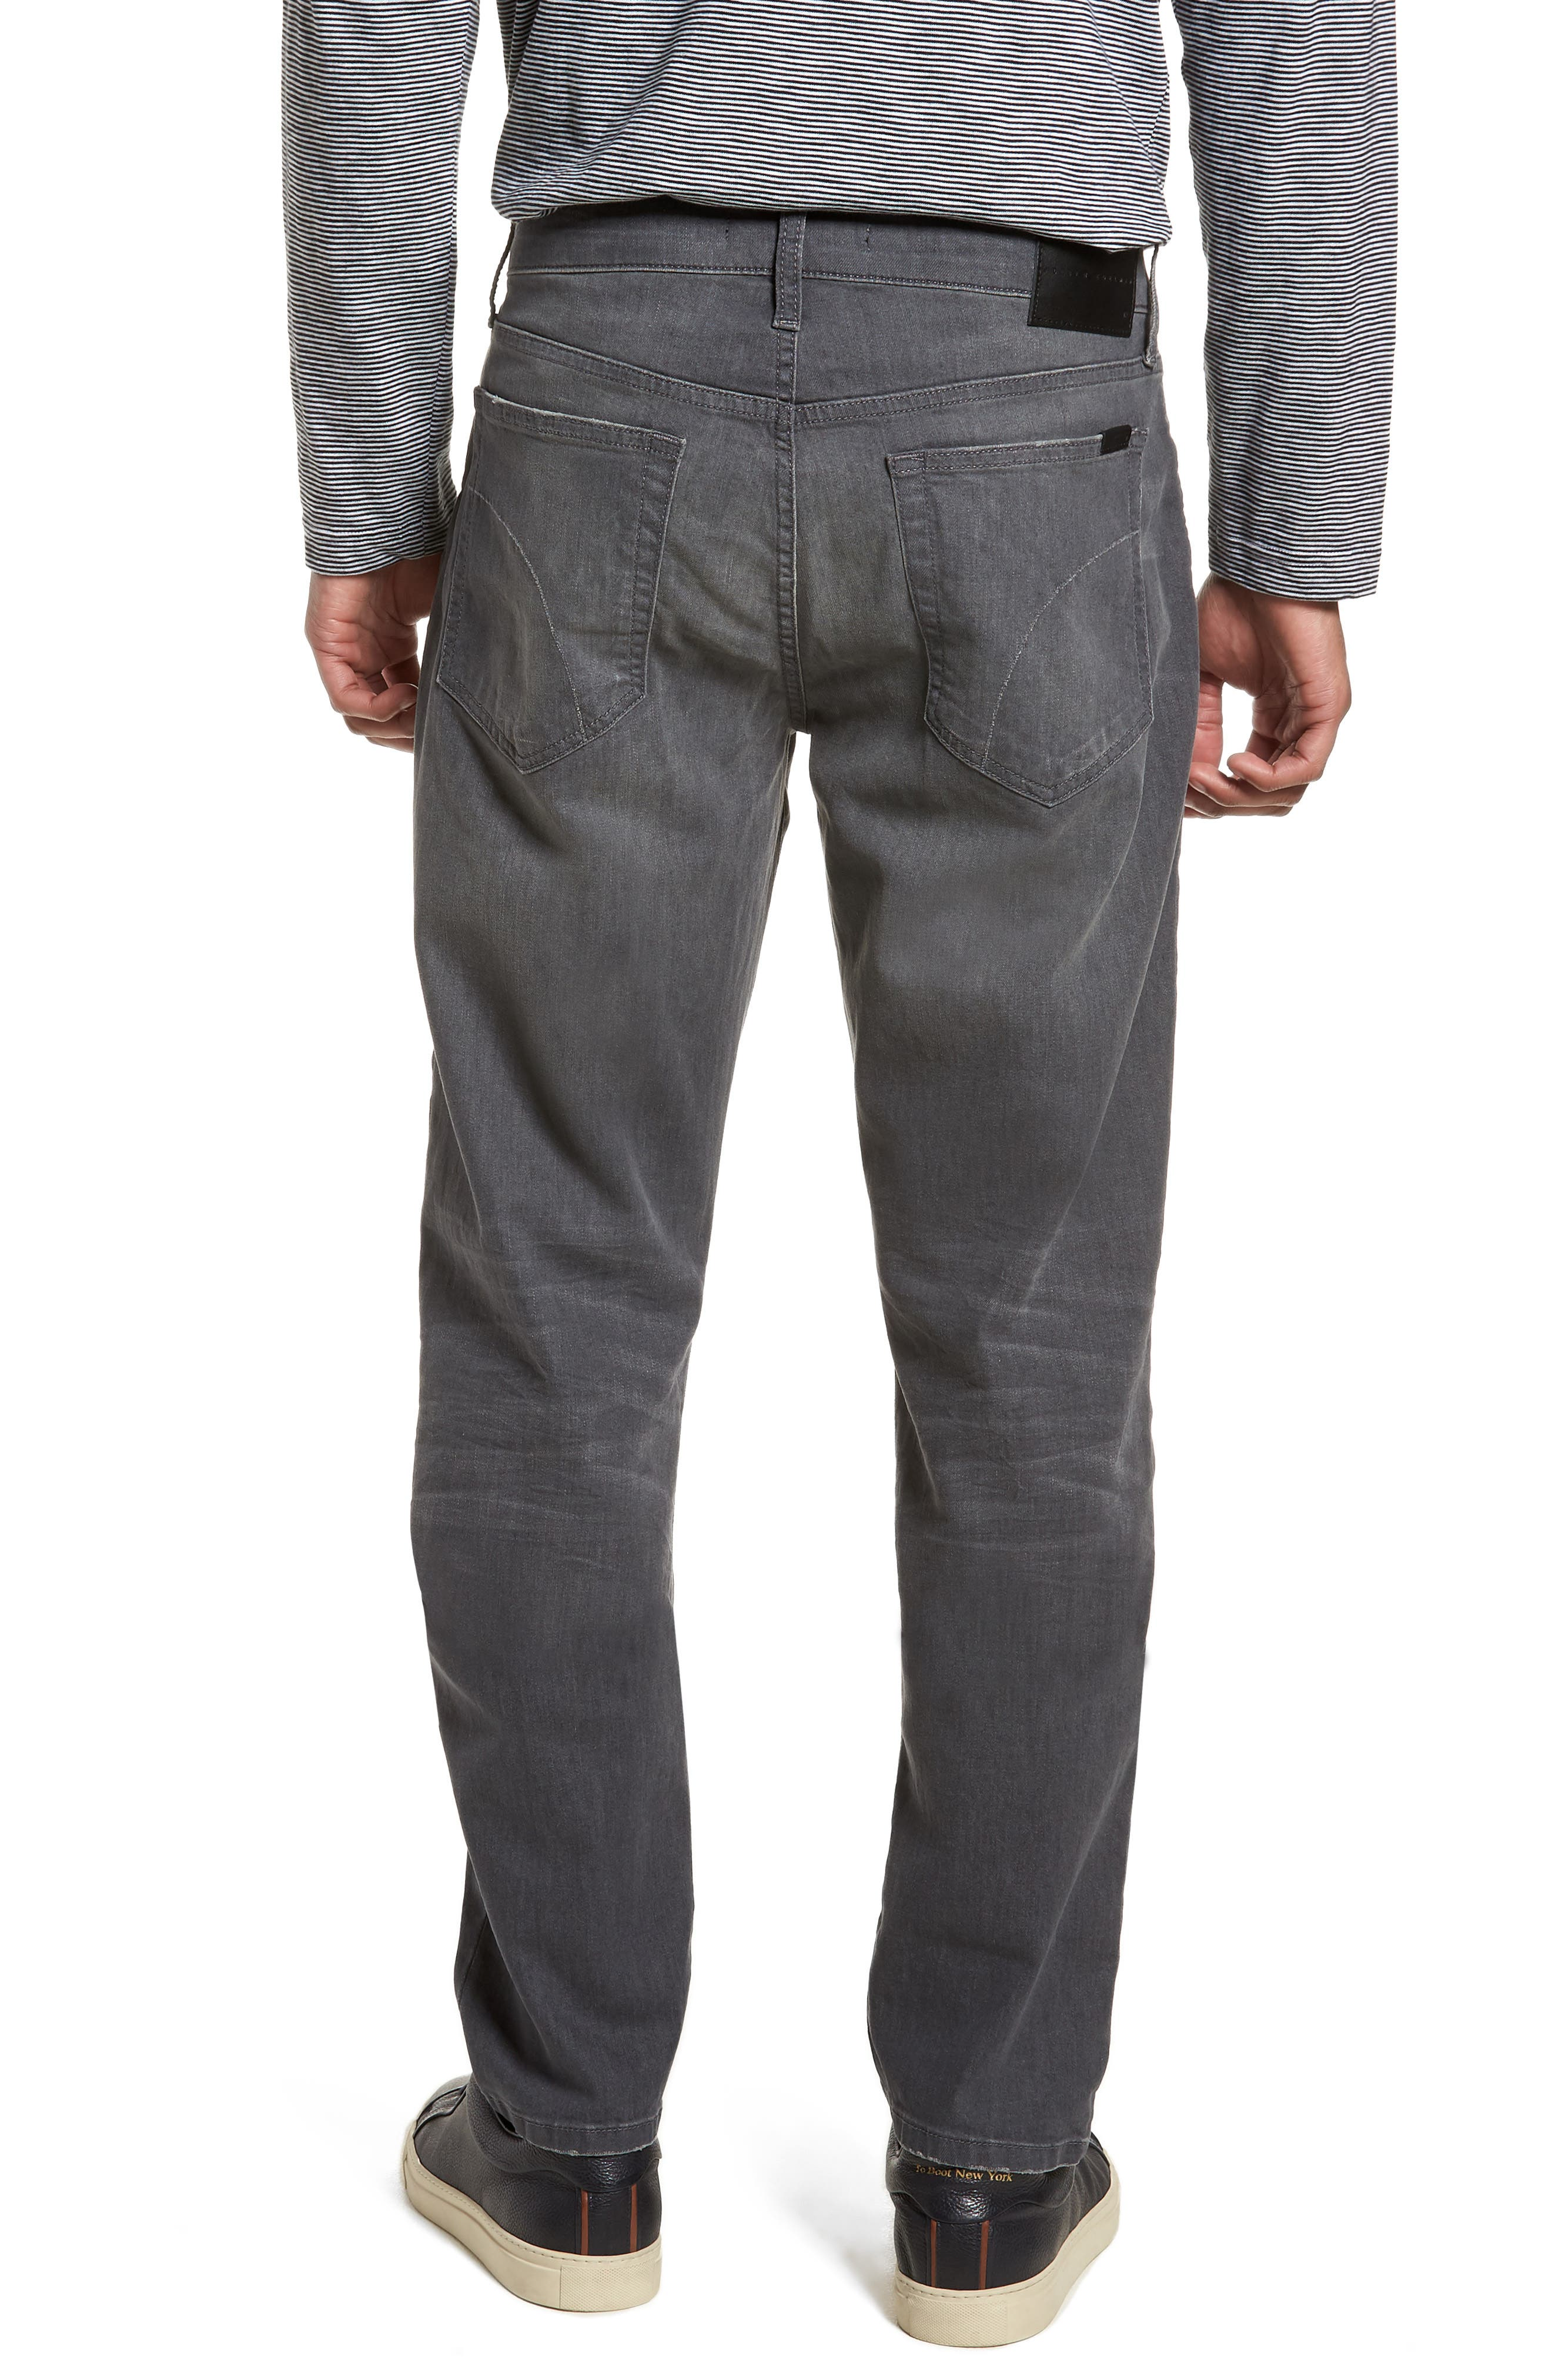 Folsom Athletic Slim Fit Jeans,                             Alternate thumbnail 2, color,                             Julian